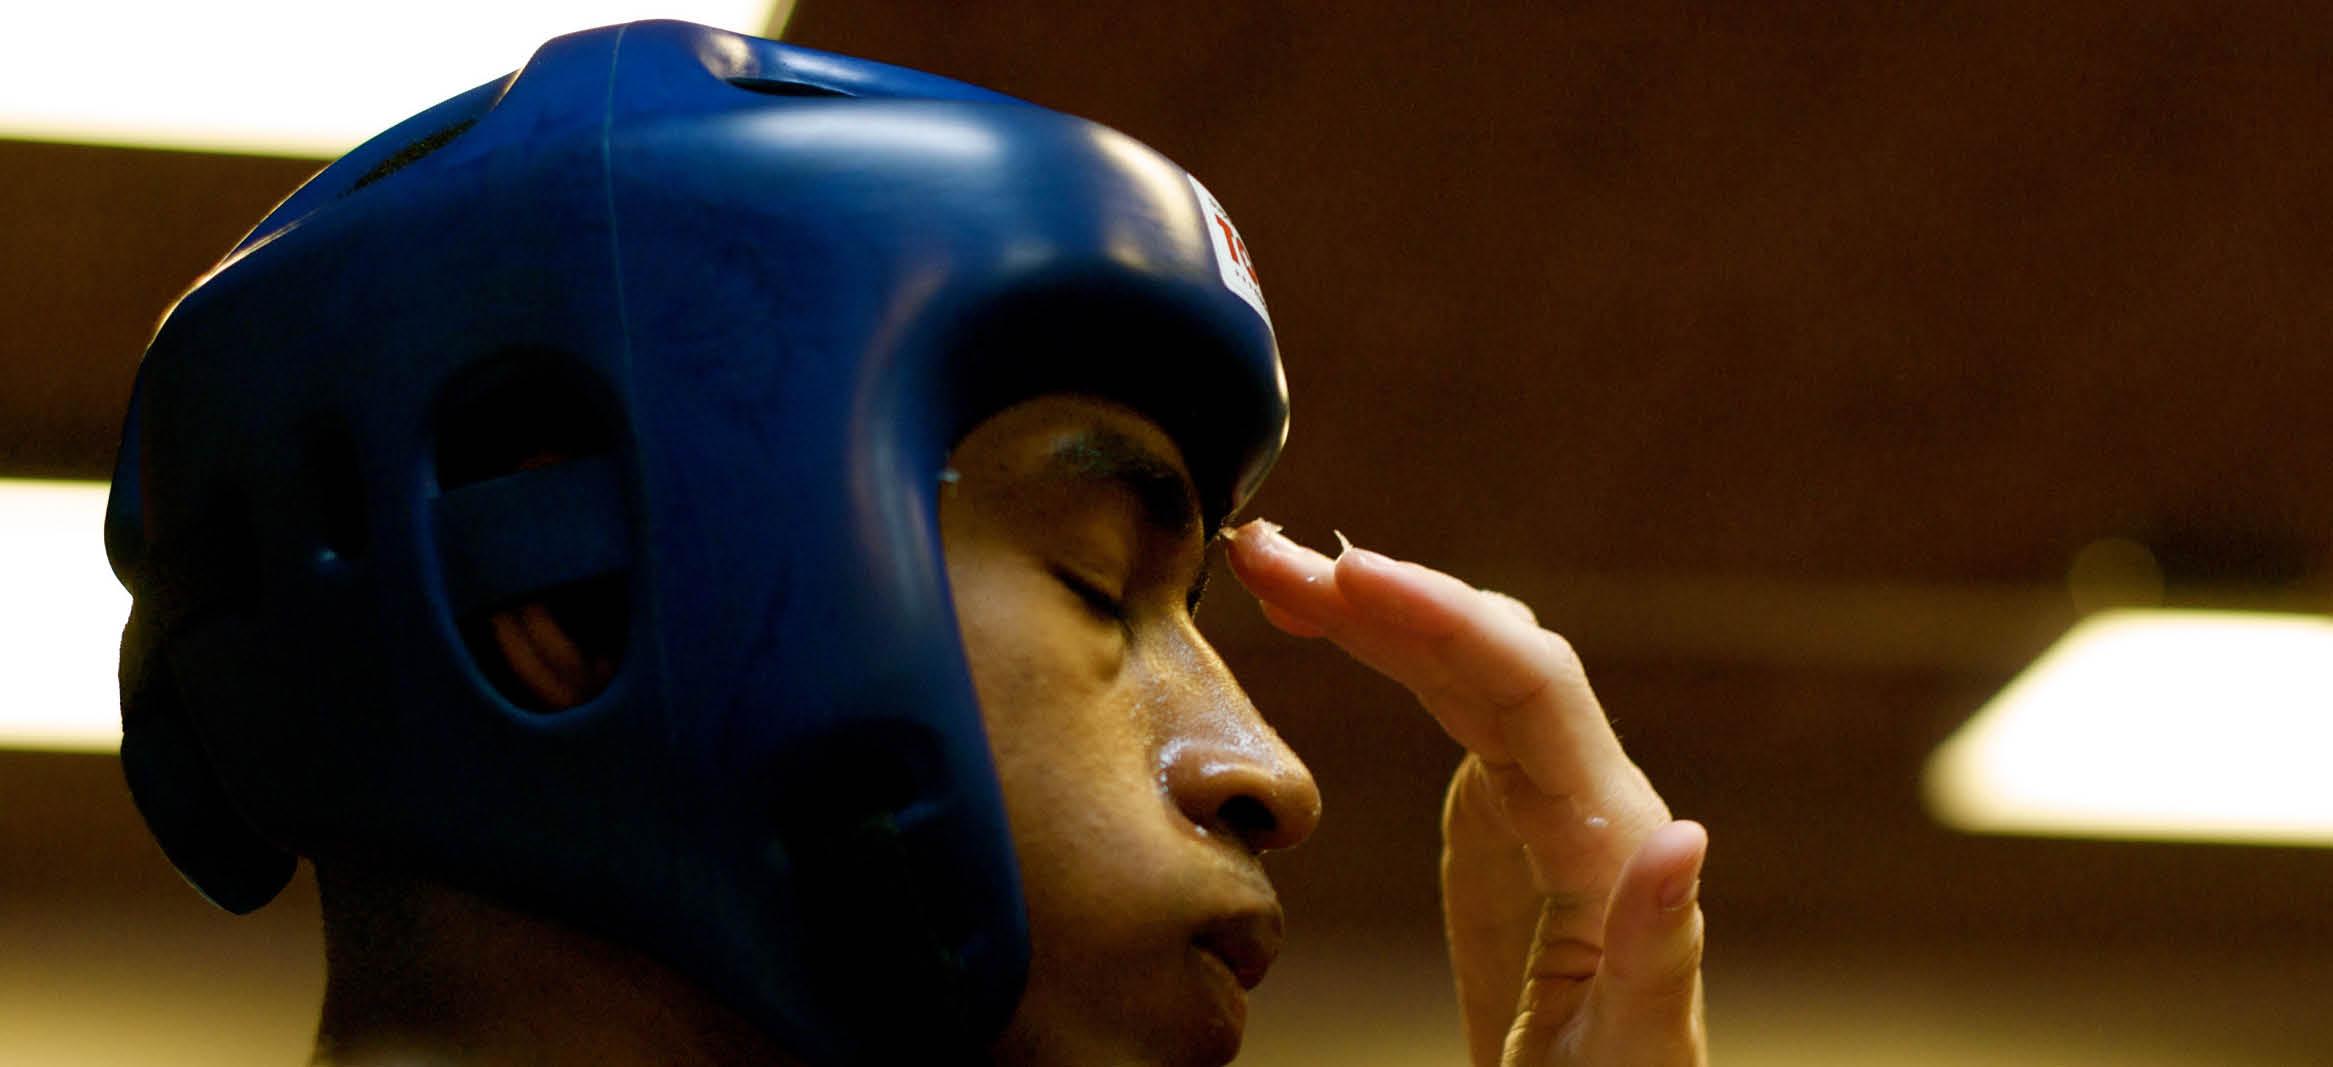 boxing woking, surrey sports, events, sports locker